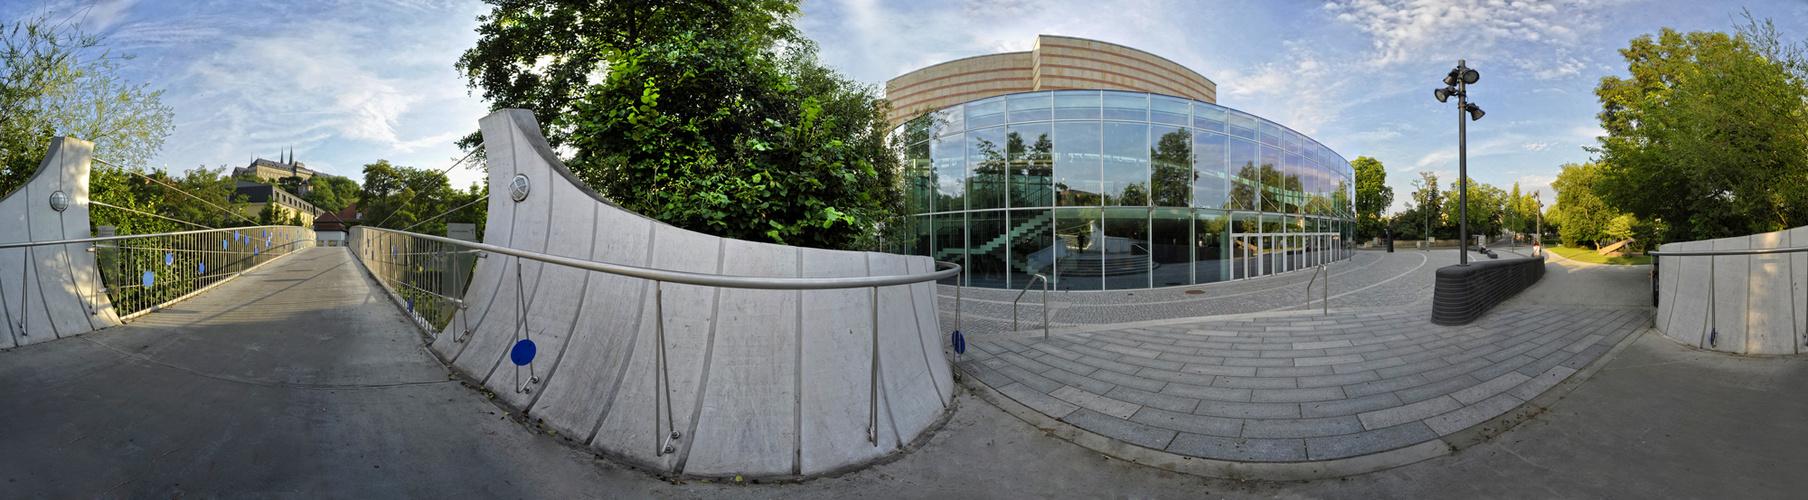 Bamberg Konzerthalle 360 Grad